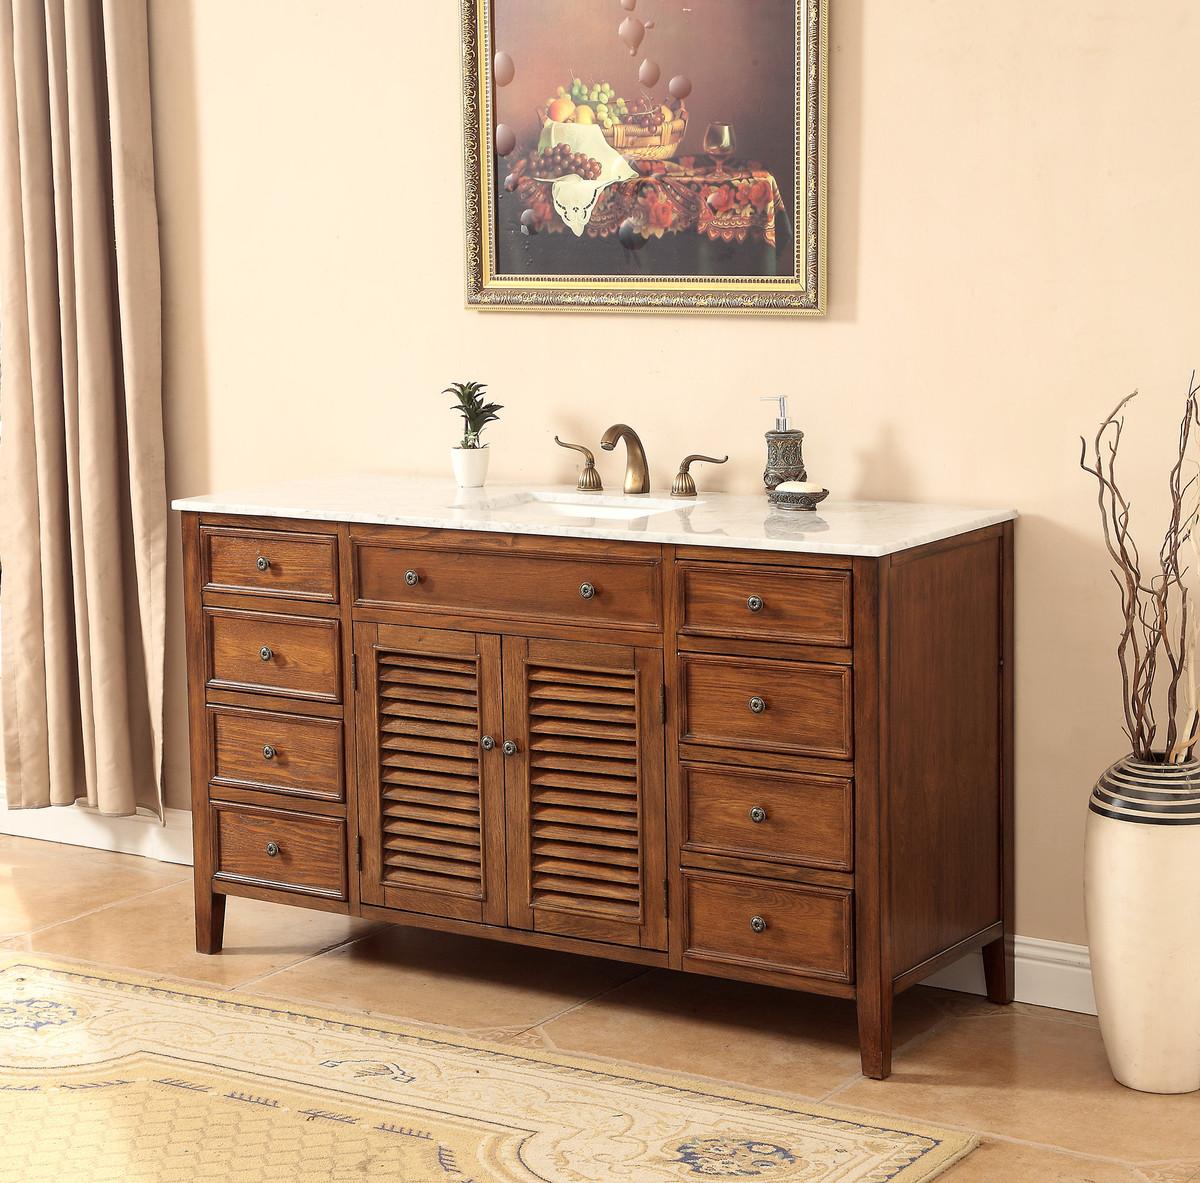 "58"" Adelina Cottage Style Single Sink Bathroom Vanity Walnut Finish with White Italian Carrara Marble Countertop and Rectangular White Porcelain Sink"